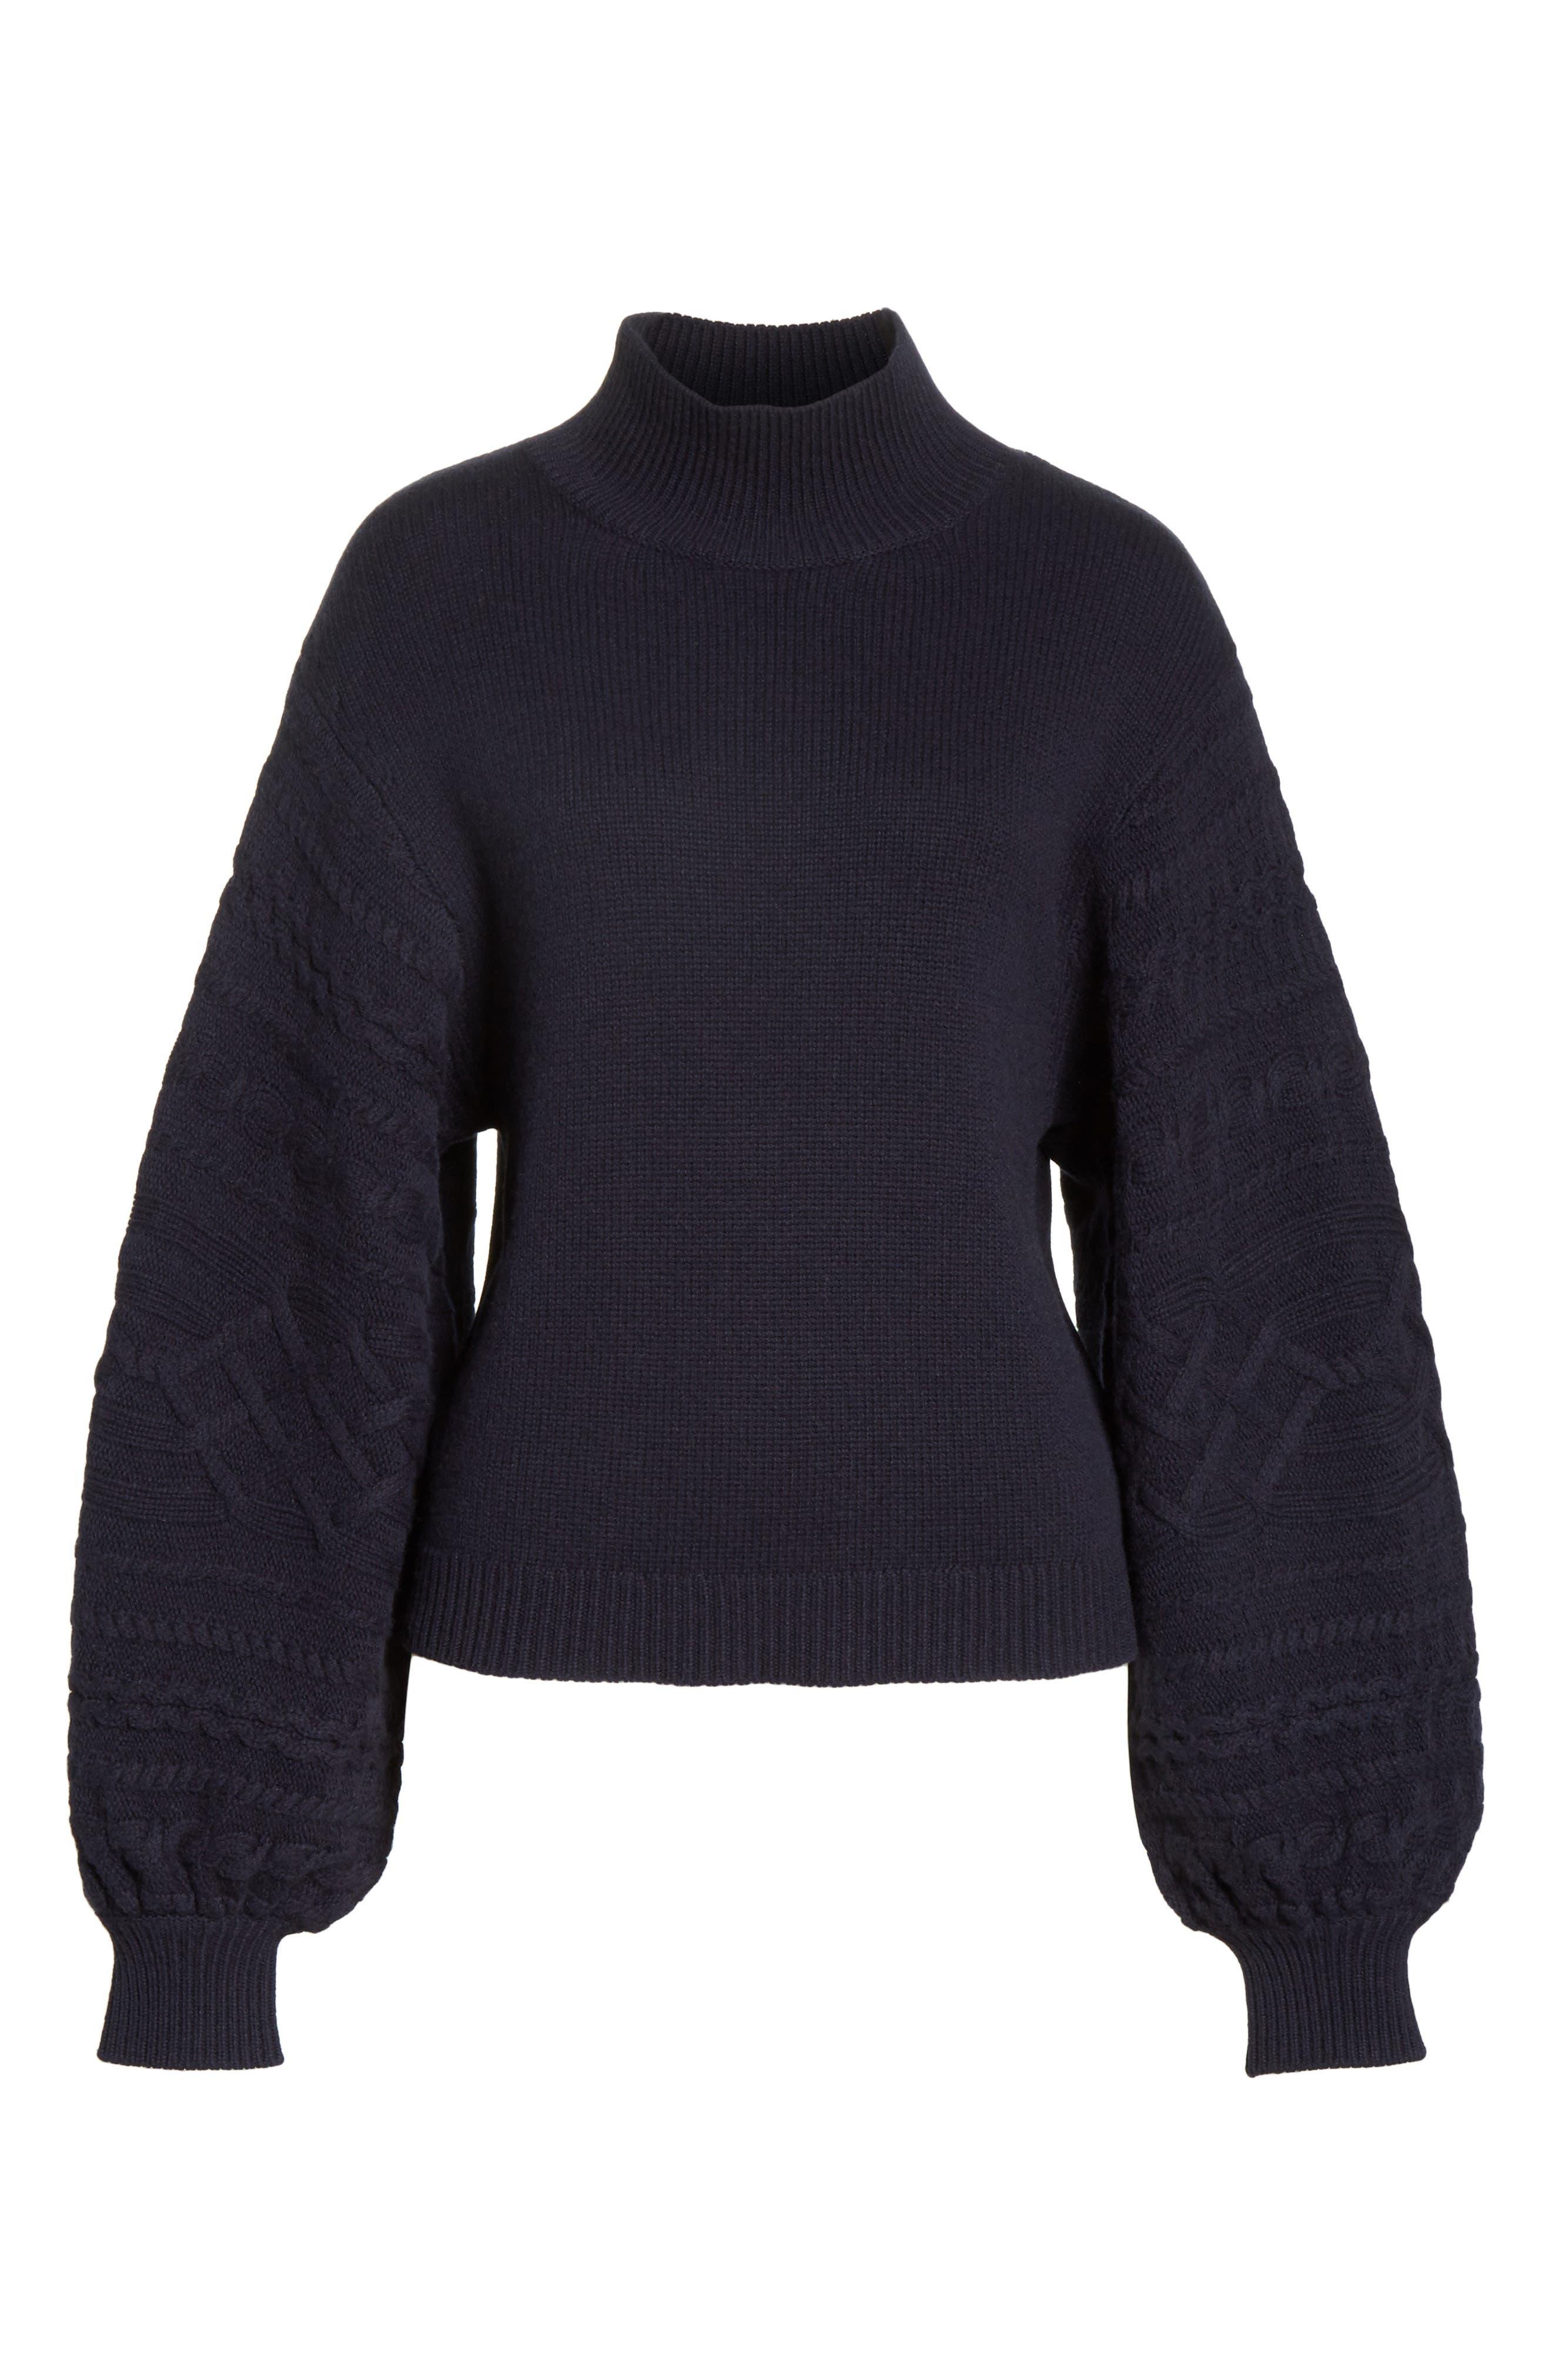 Lathen Mock Neck Sweater,                             Alternate thumbnail 6, color,                             Midnight